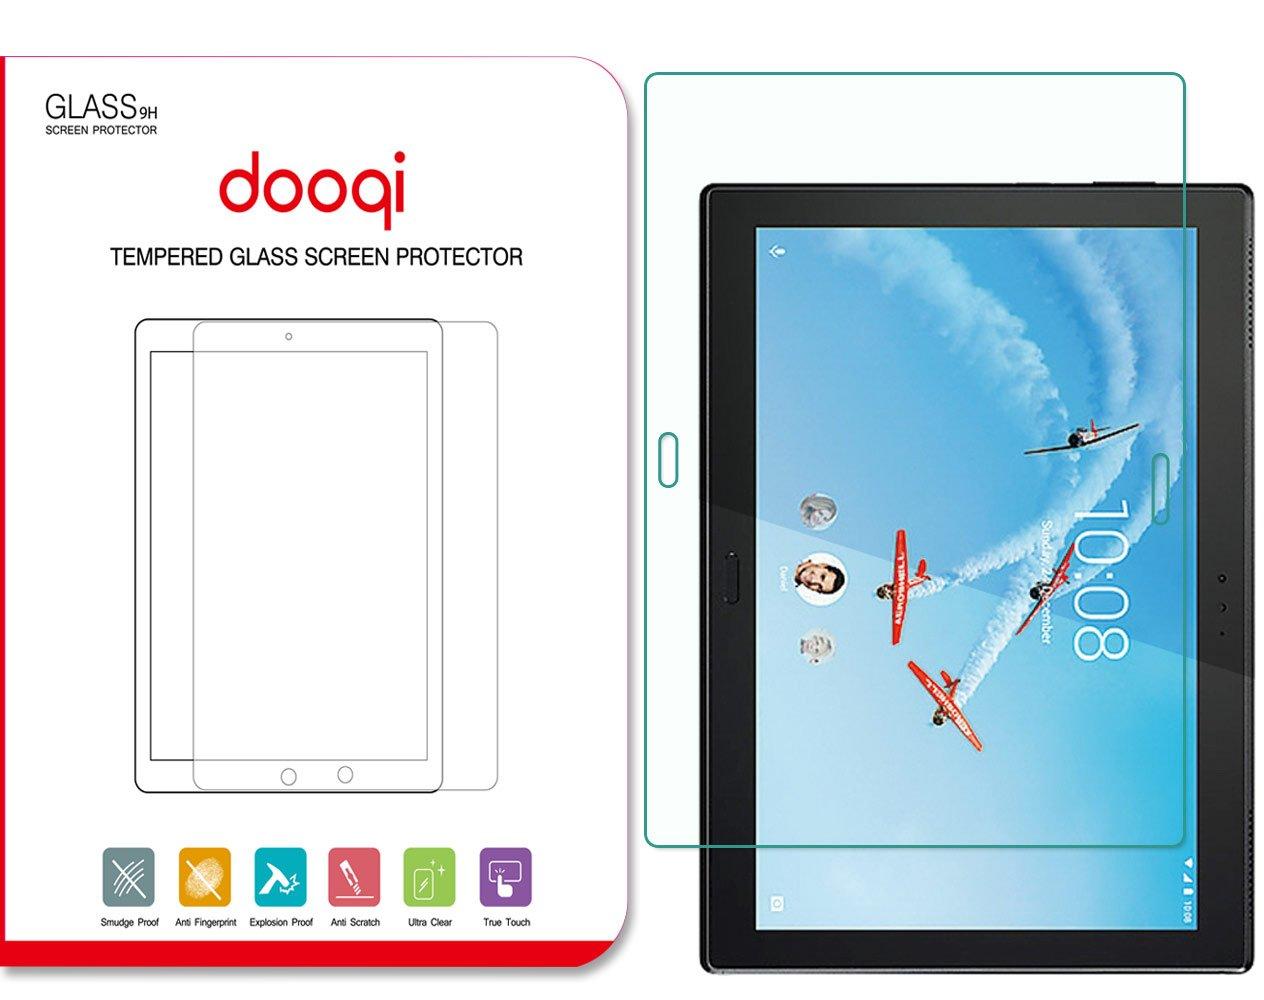 Dooqi Premium Tempered Glass Screen Protector Saver for Lenovo Tab 4 10